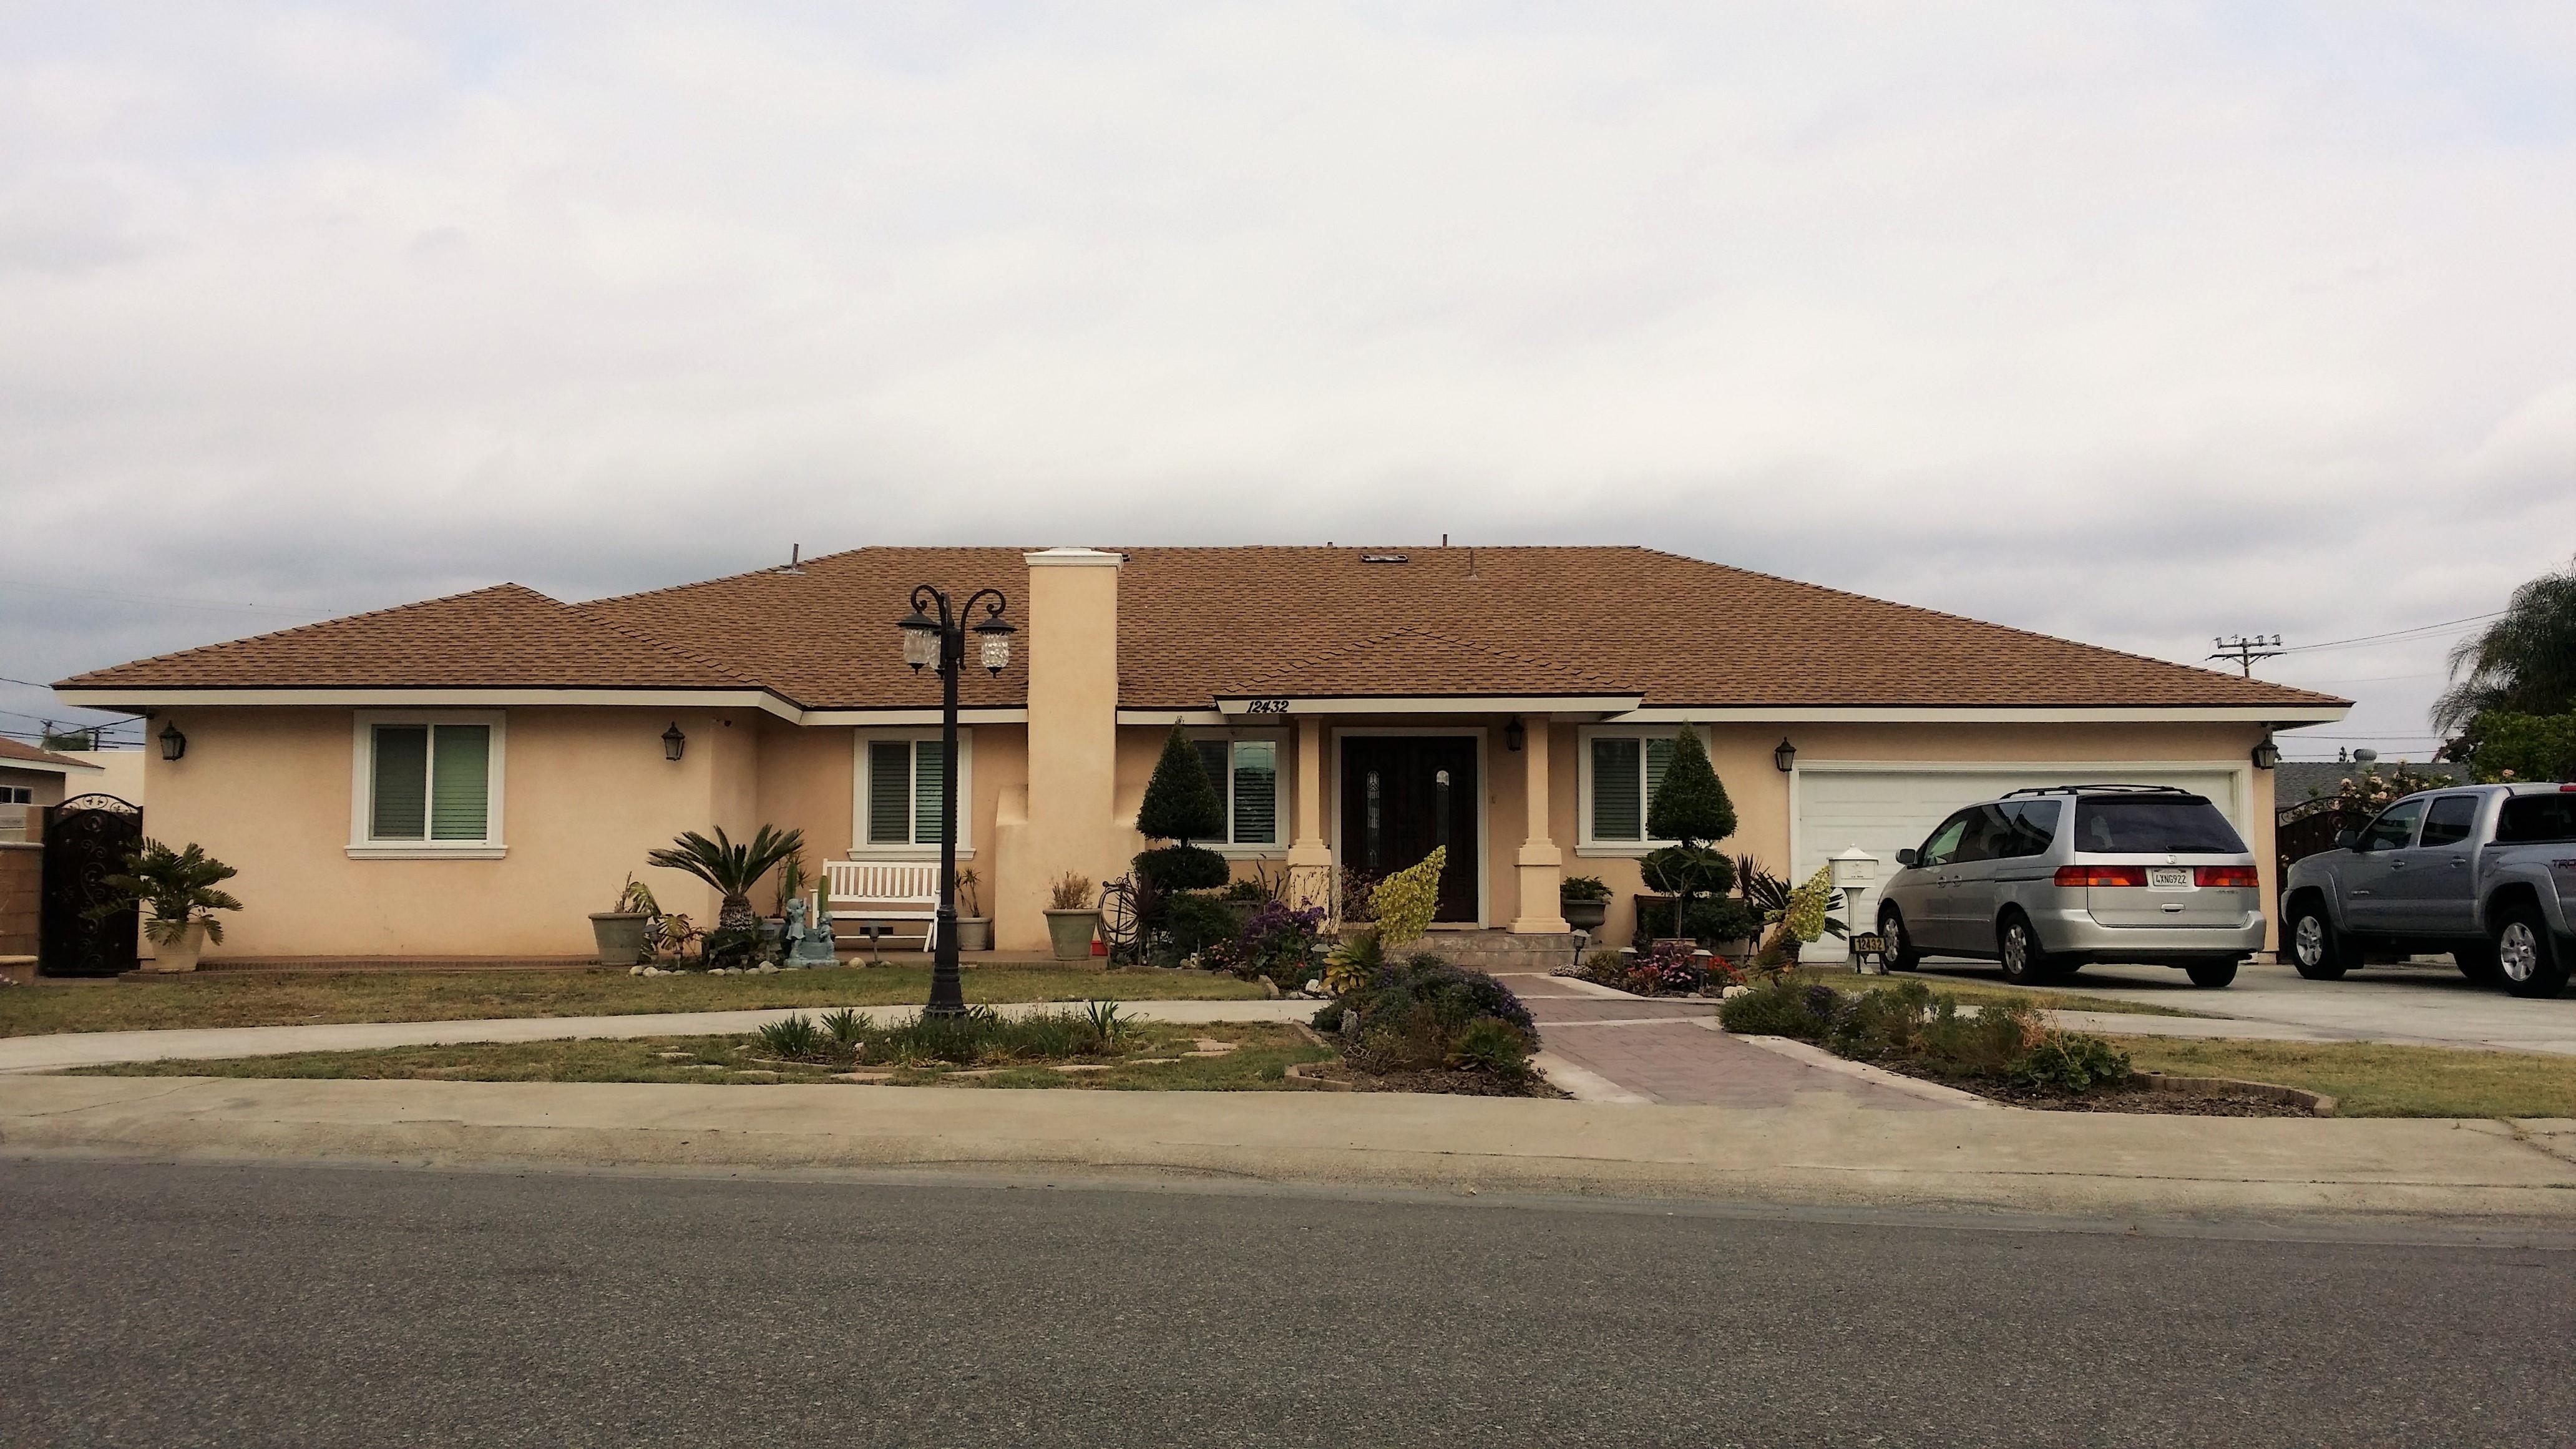 12635 Main St Apt 114, Garden Grove, CA 92840 | RealEstate.com